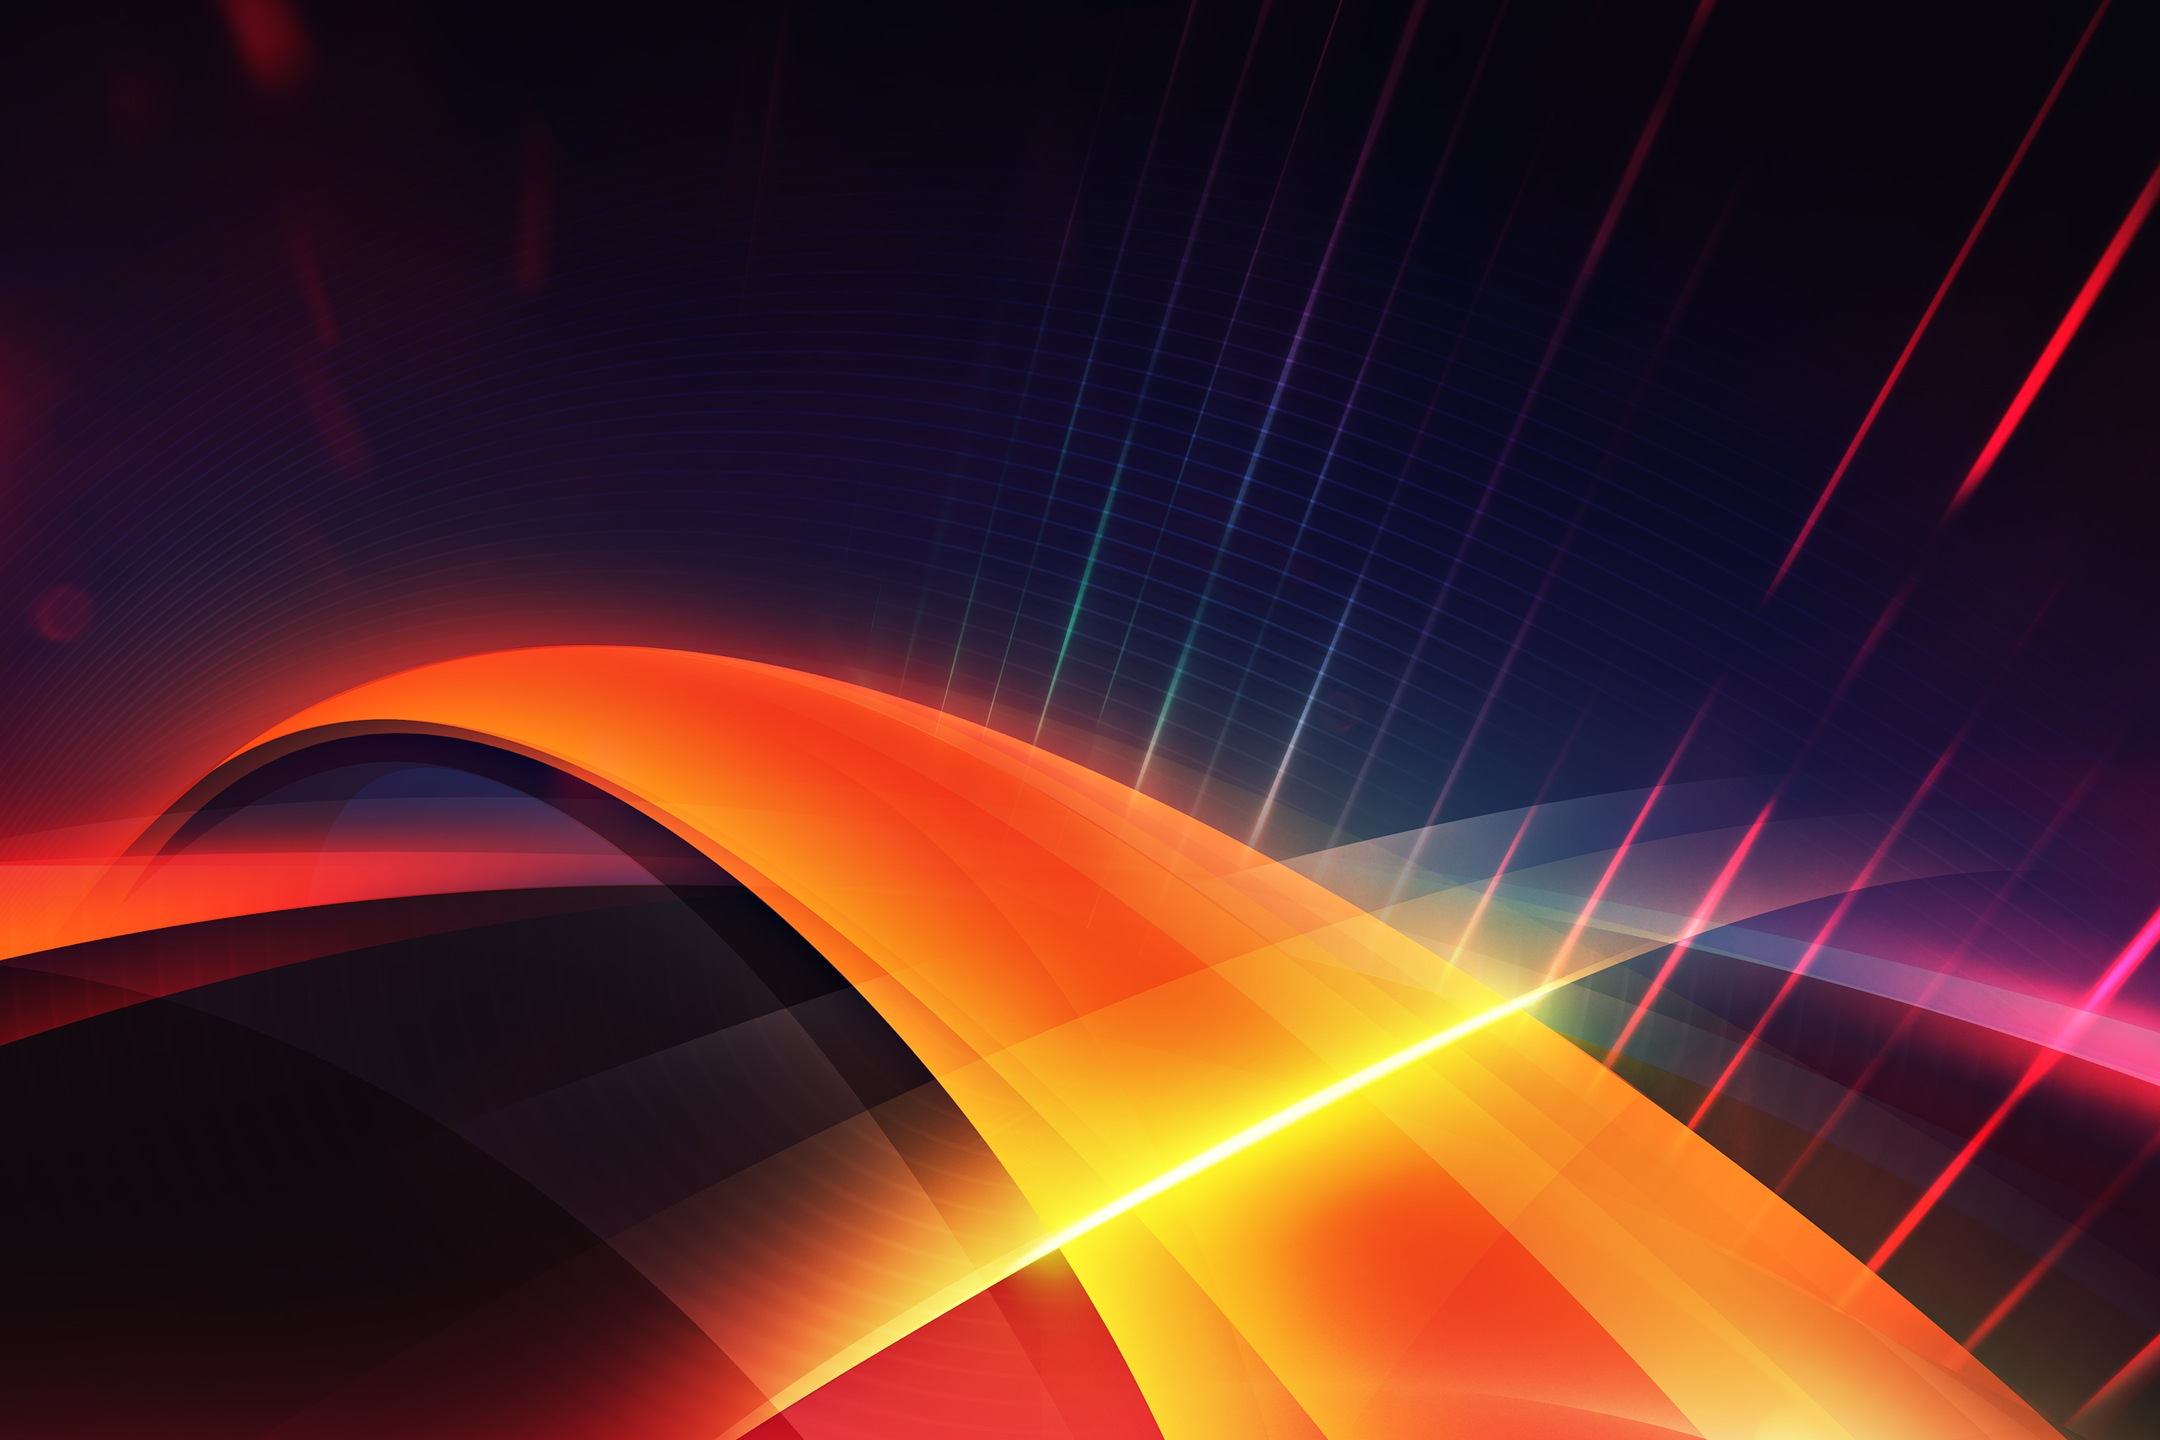 21601440 Wallpaper 01736 PCnet 2160x1440